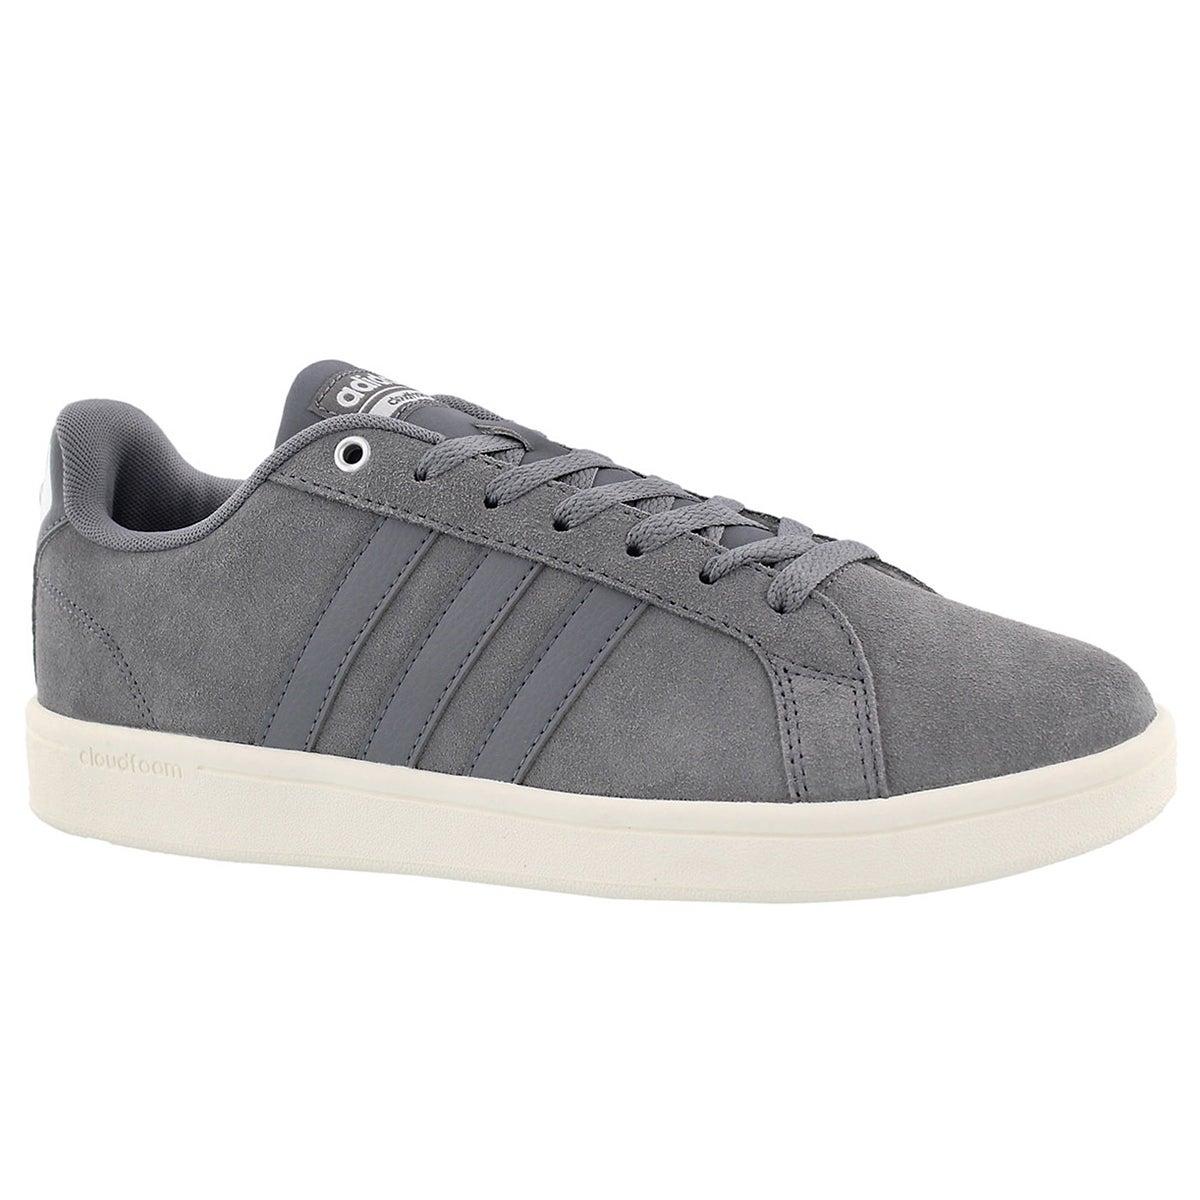 Men's CLOUDFOAM ADVANTAGE grey sneakers